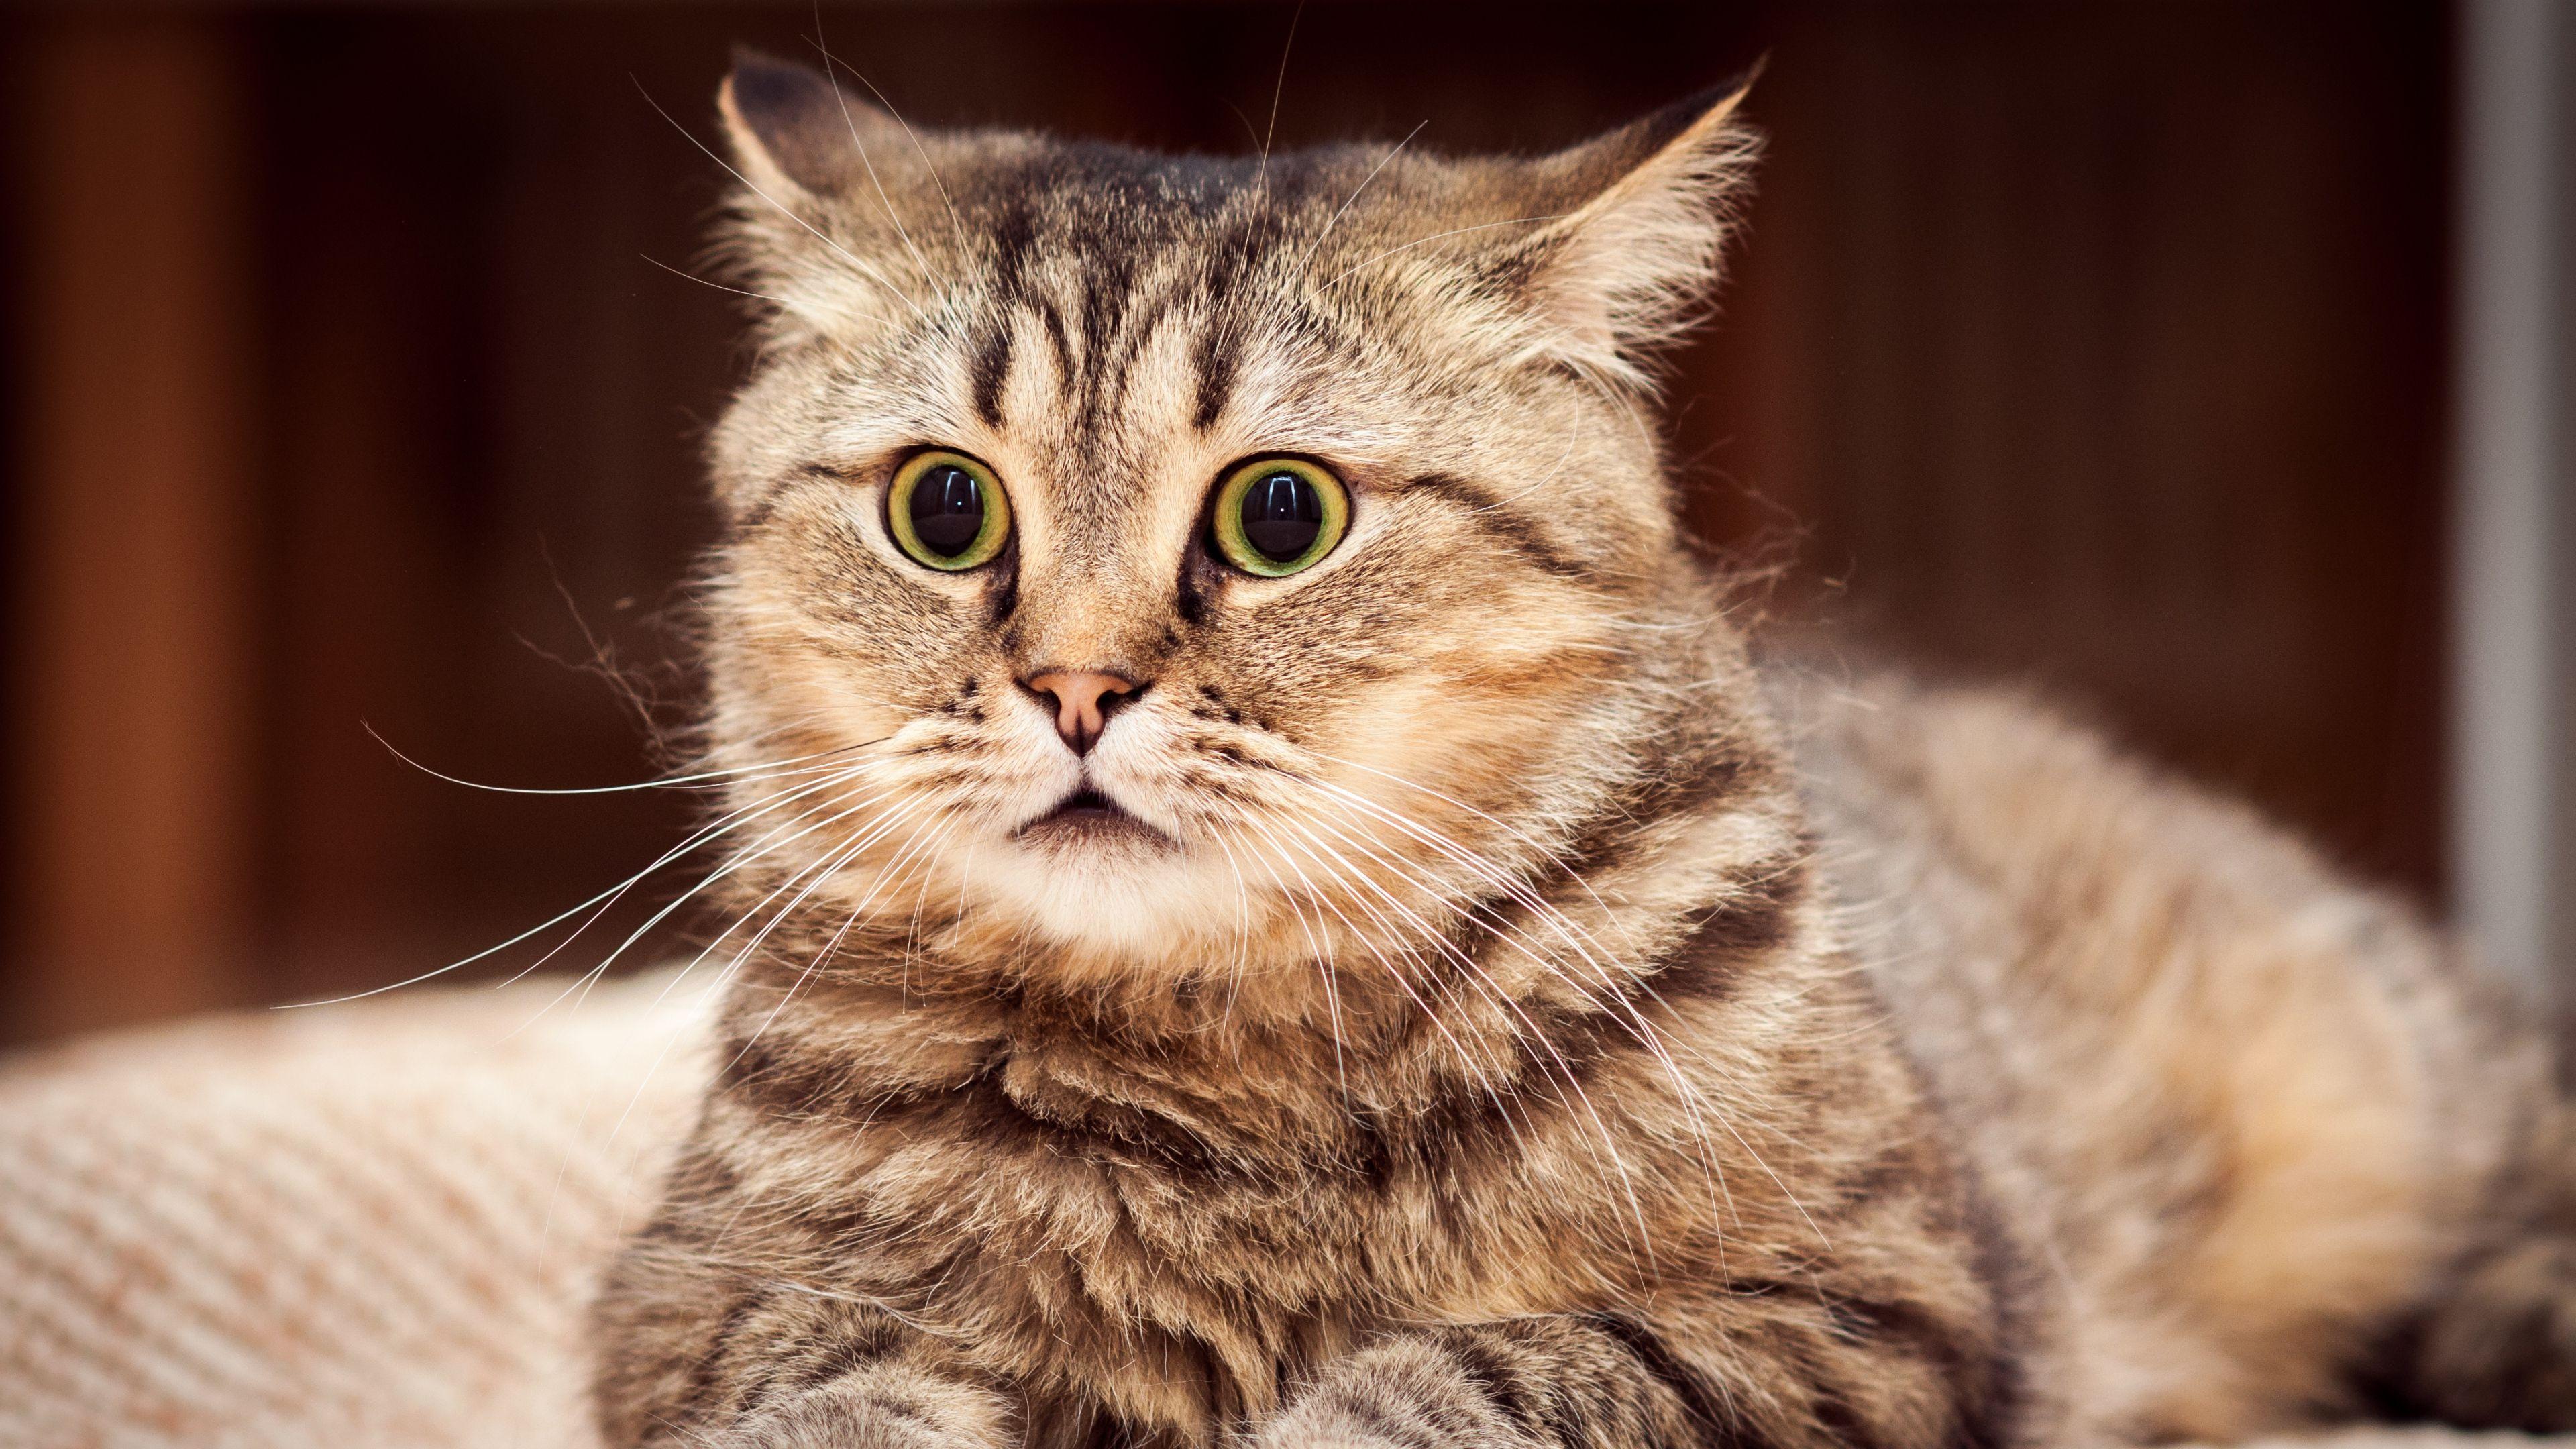 Cat 4k Wallpapers Top Free Cat 4k Backgrounds Wallpaperaccess